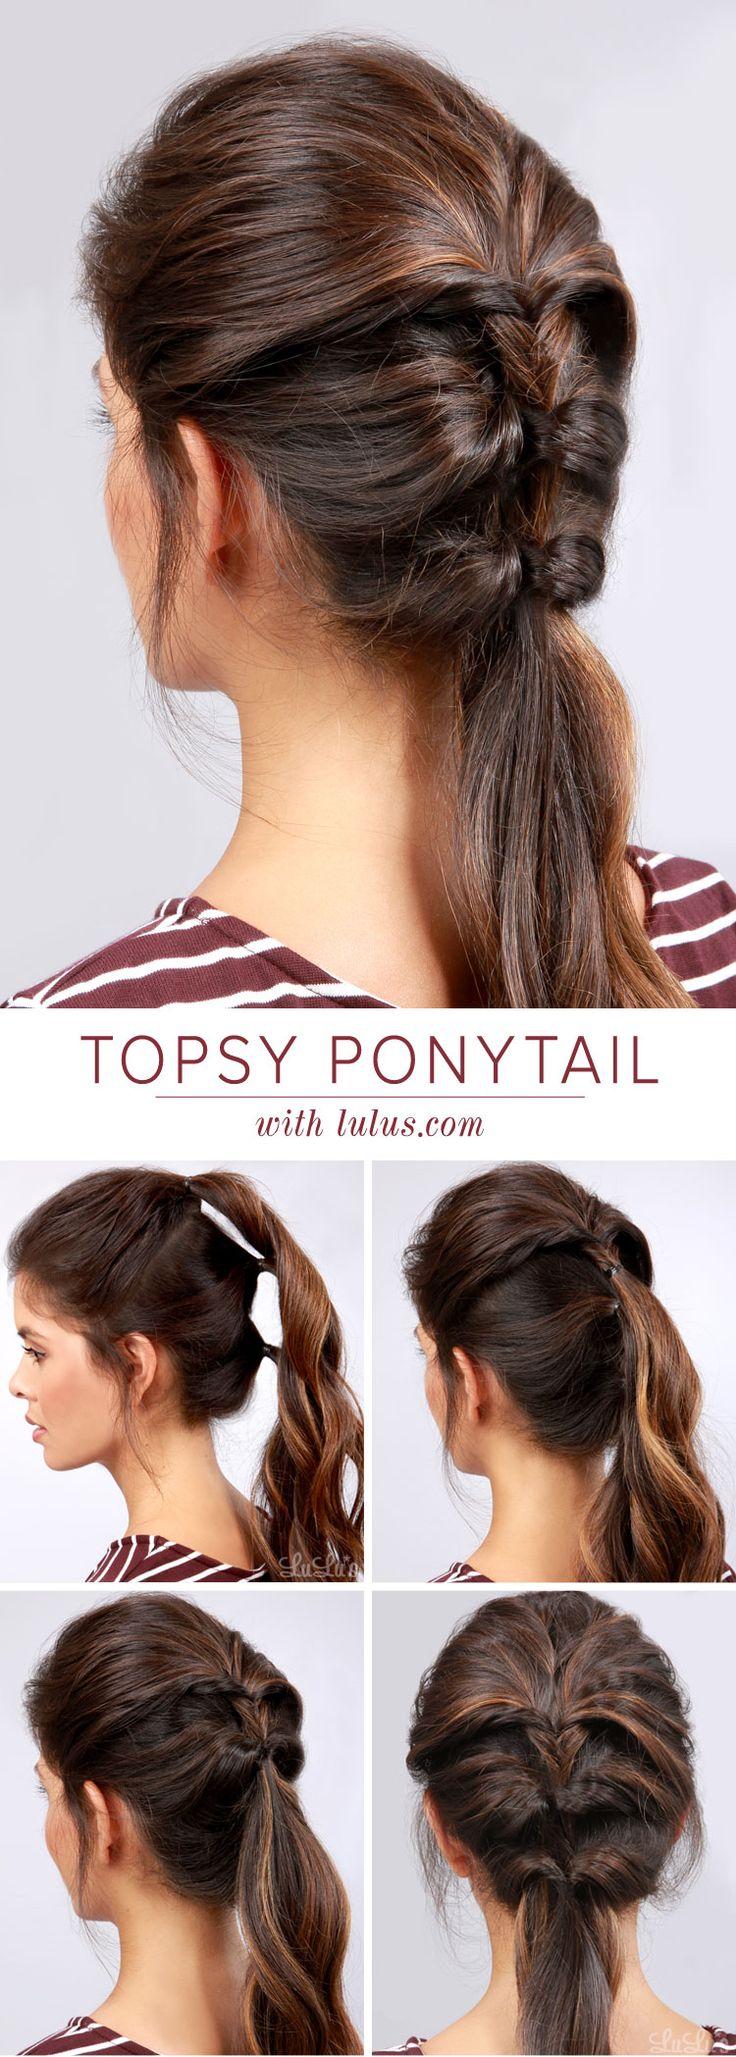 Topsy Ponytail Hair Tutorial